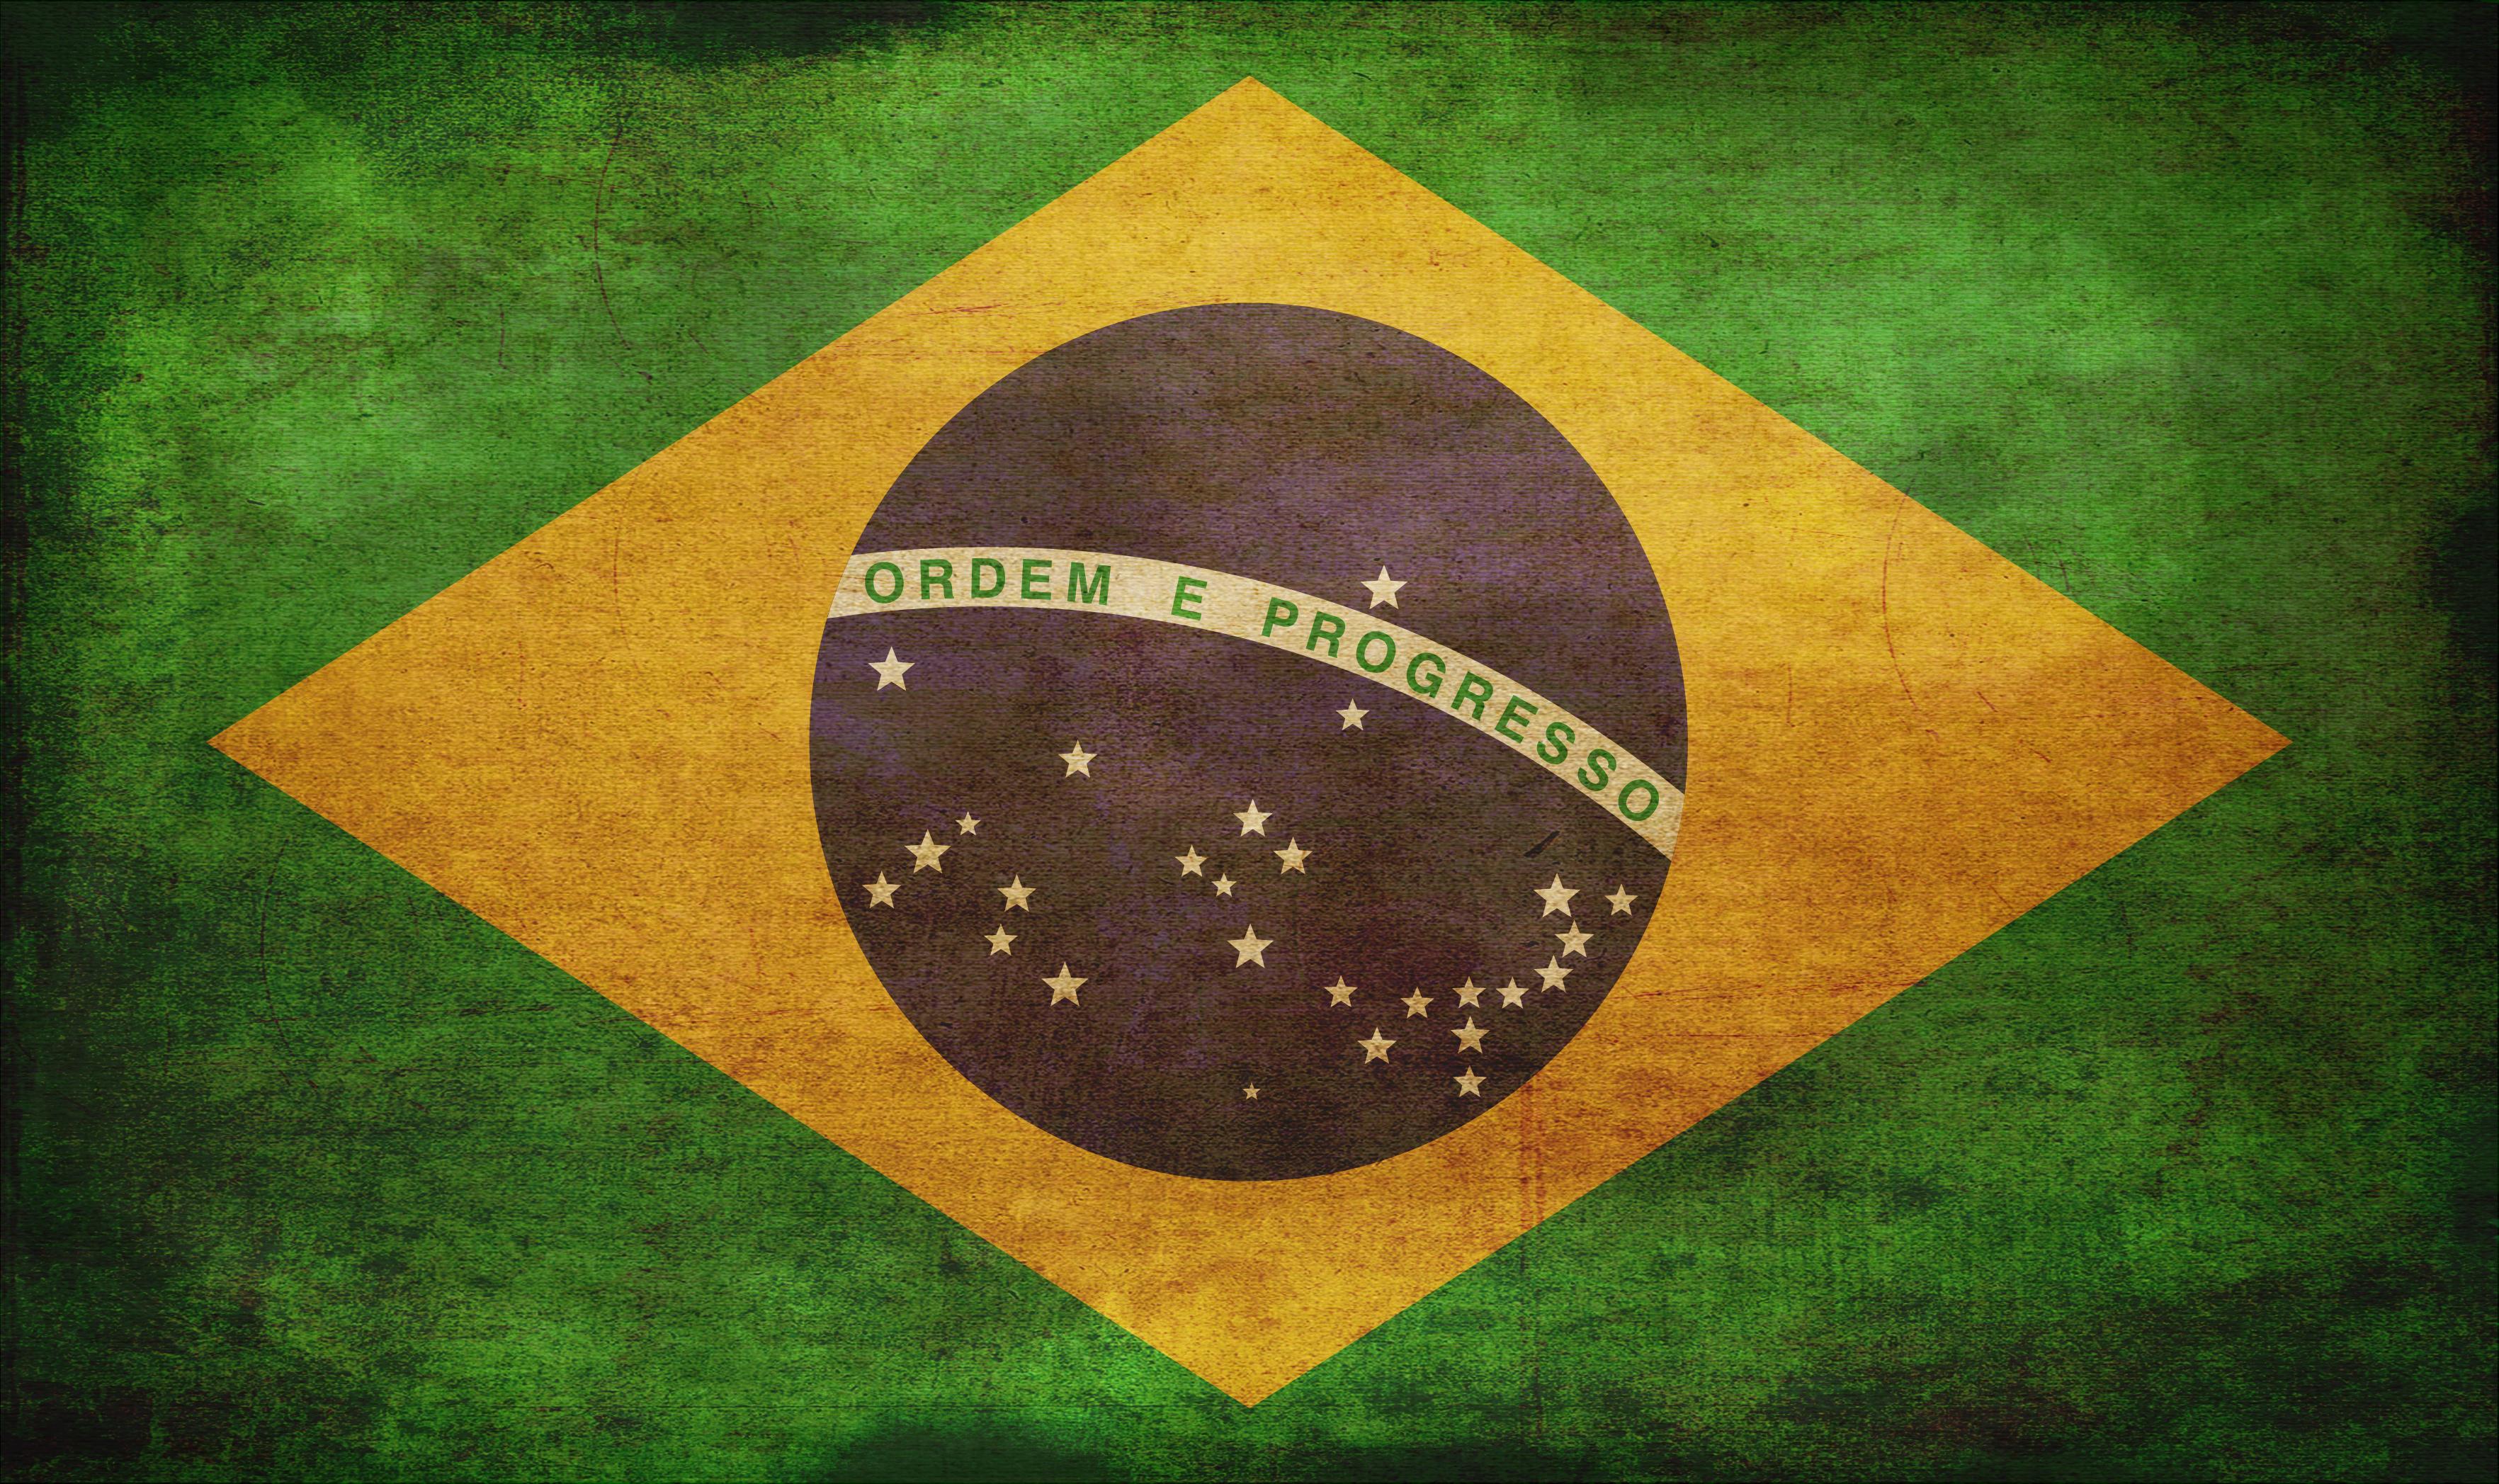 Brazil - Grunge by tonemapped